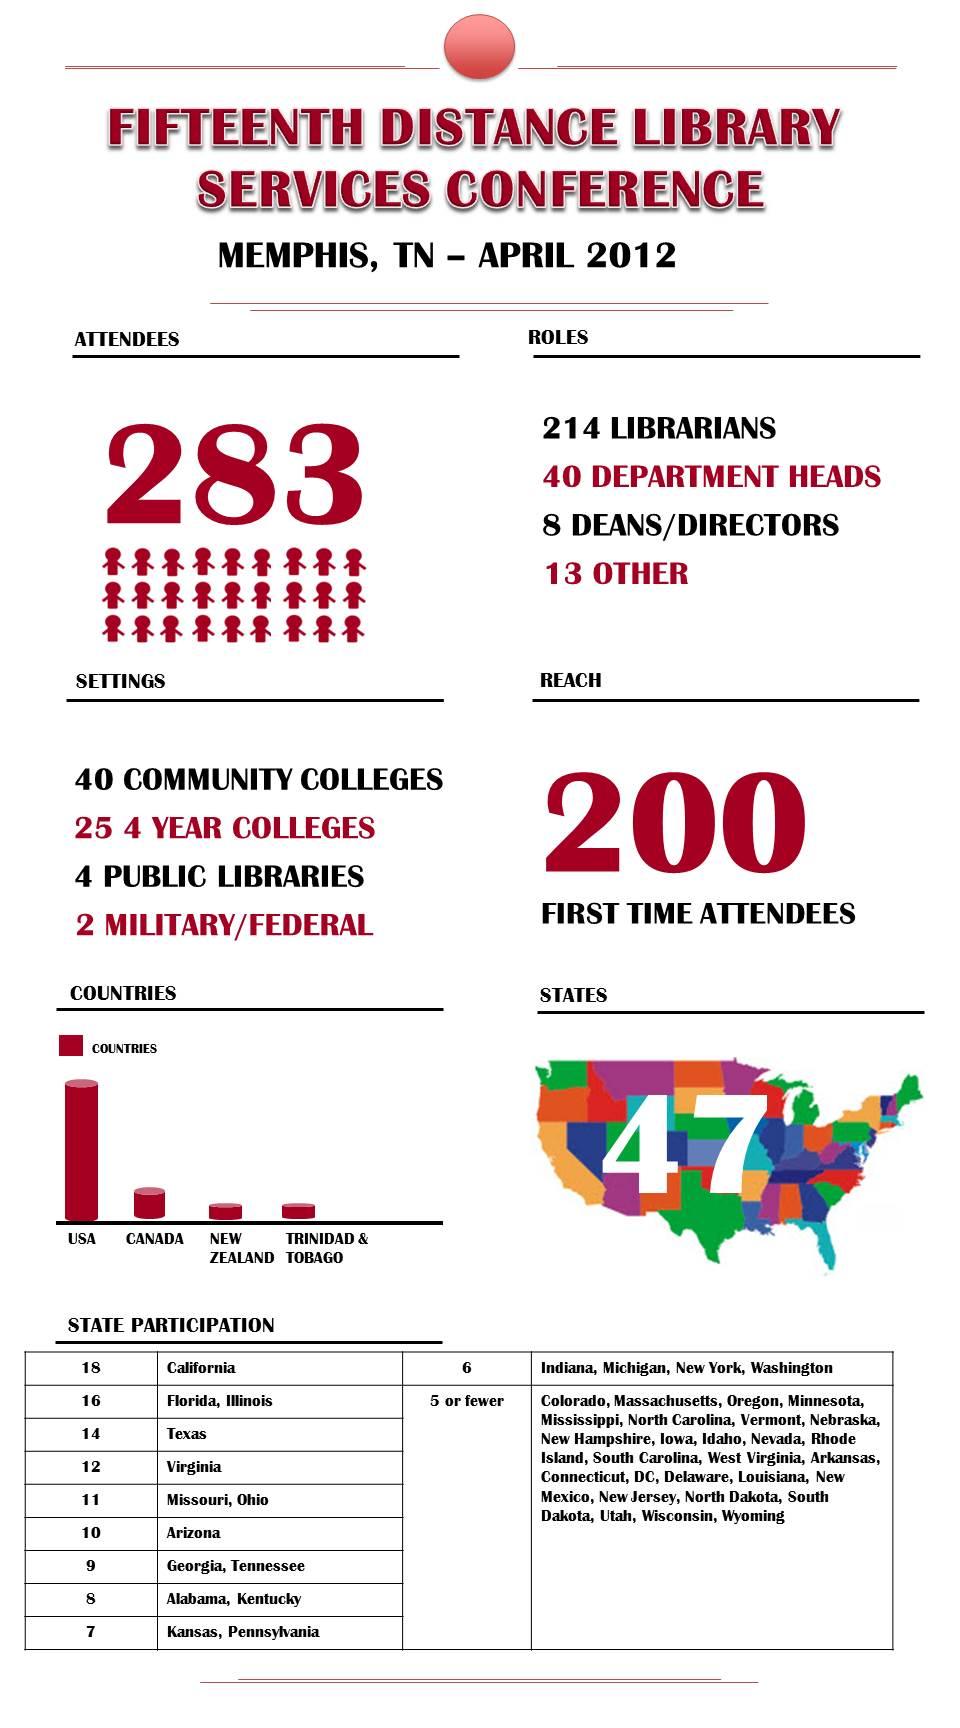 2012 Conference Demographics